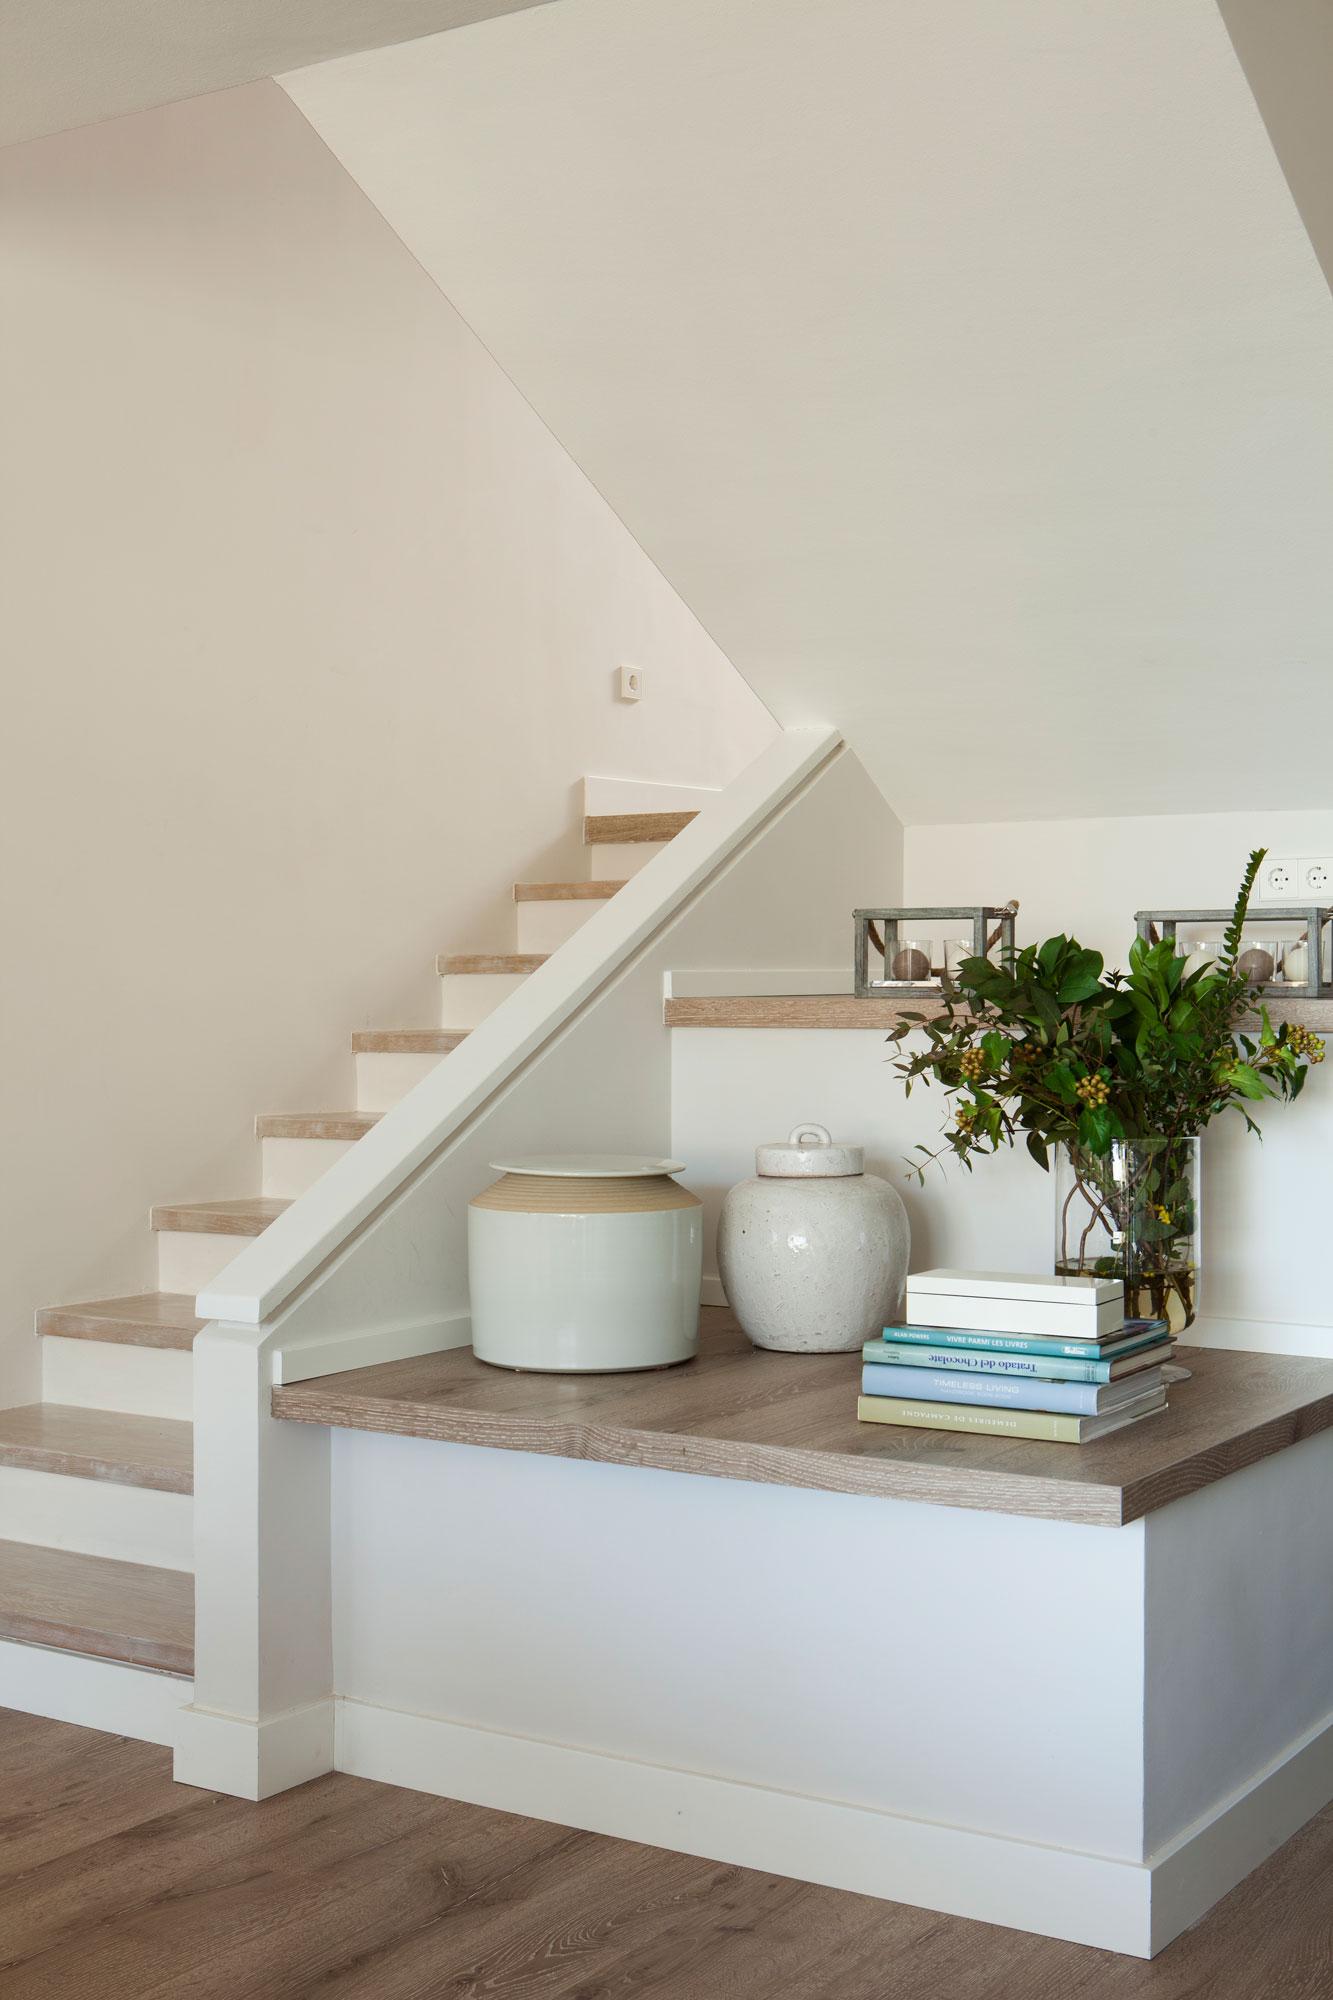 Aprovecha el hueco bajo la escalera for Como iluminar una escalera